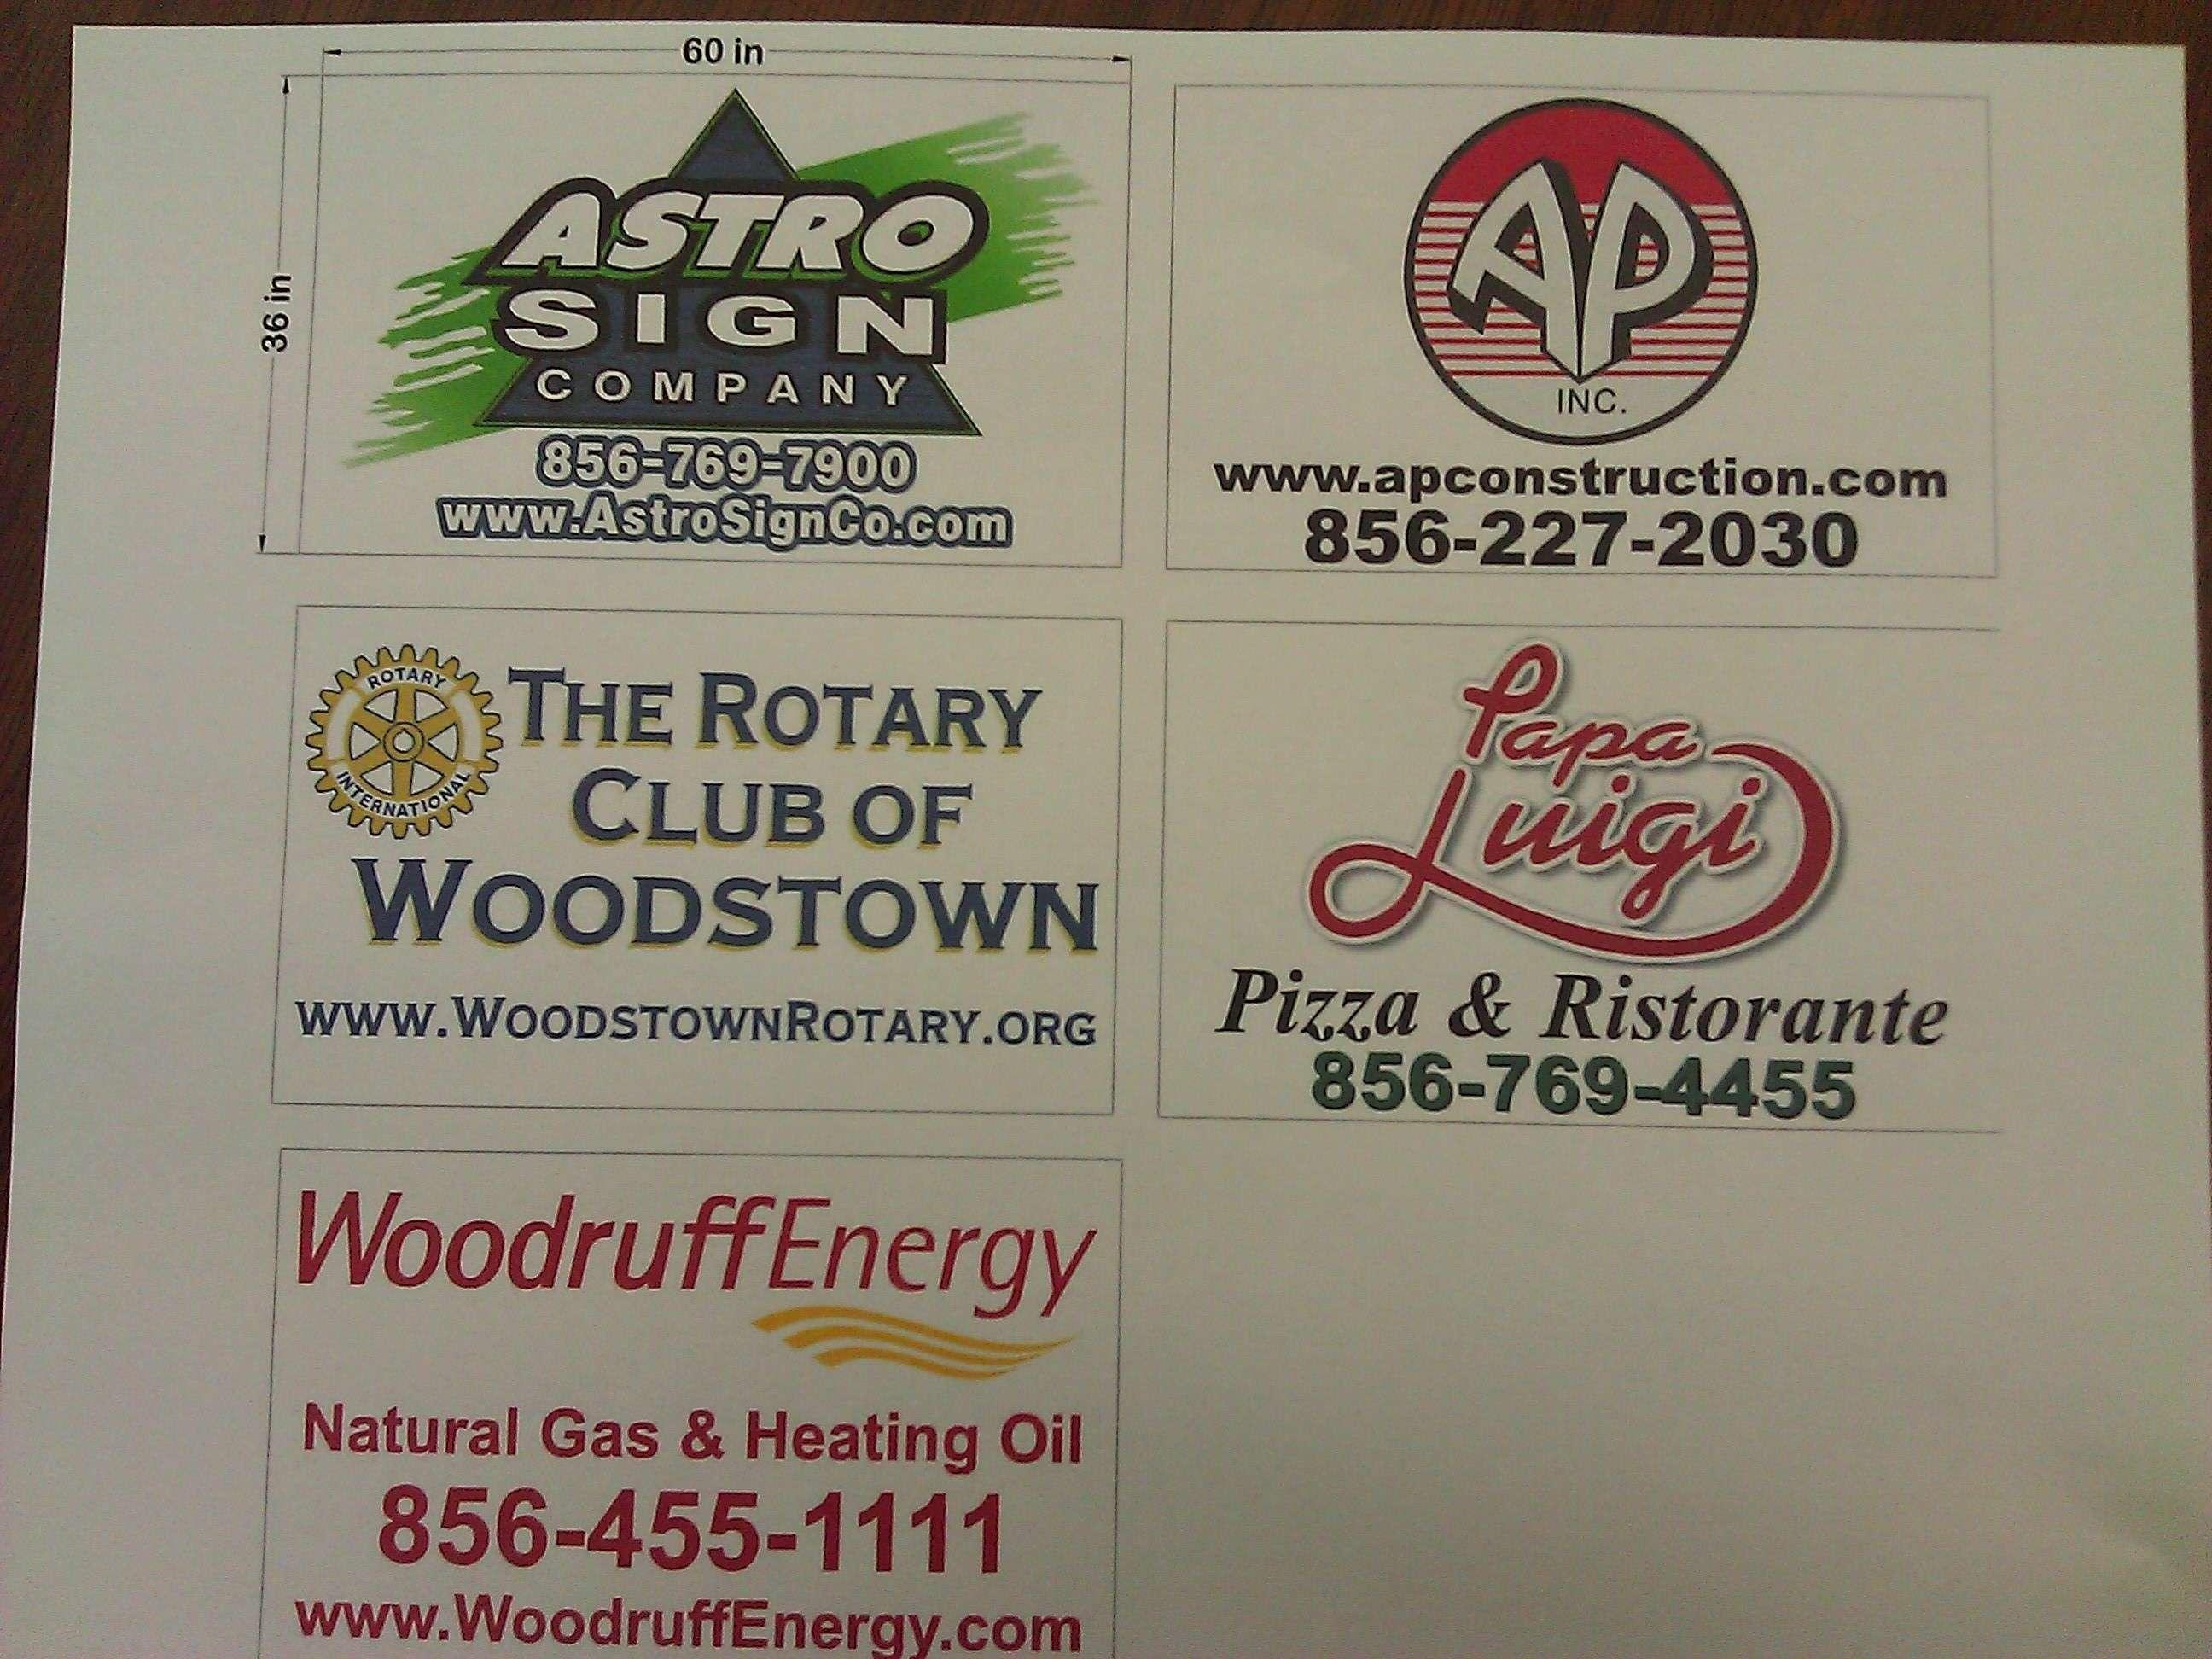 2012 Sign sponsors